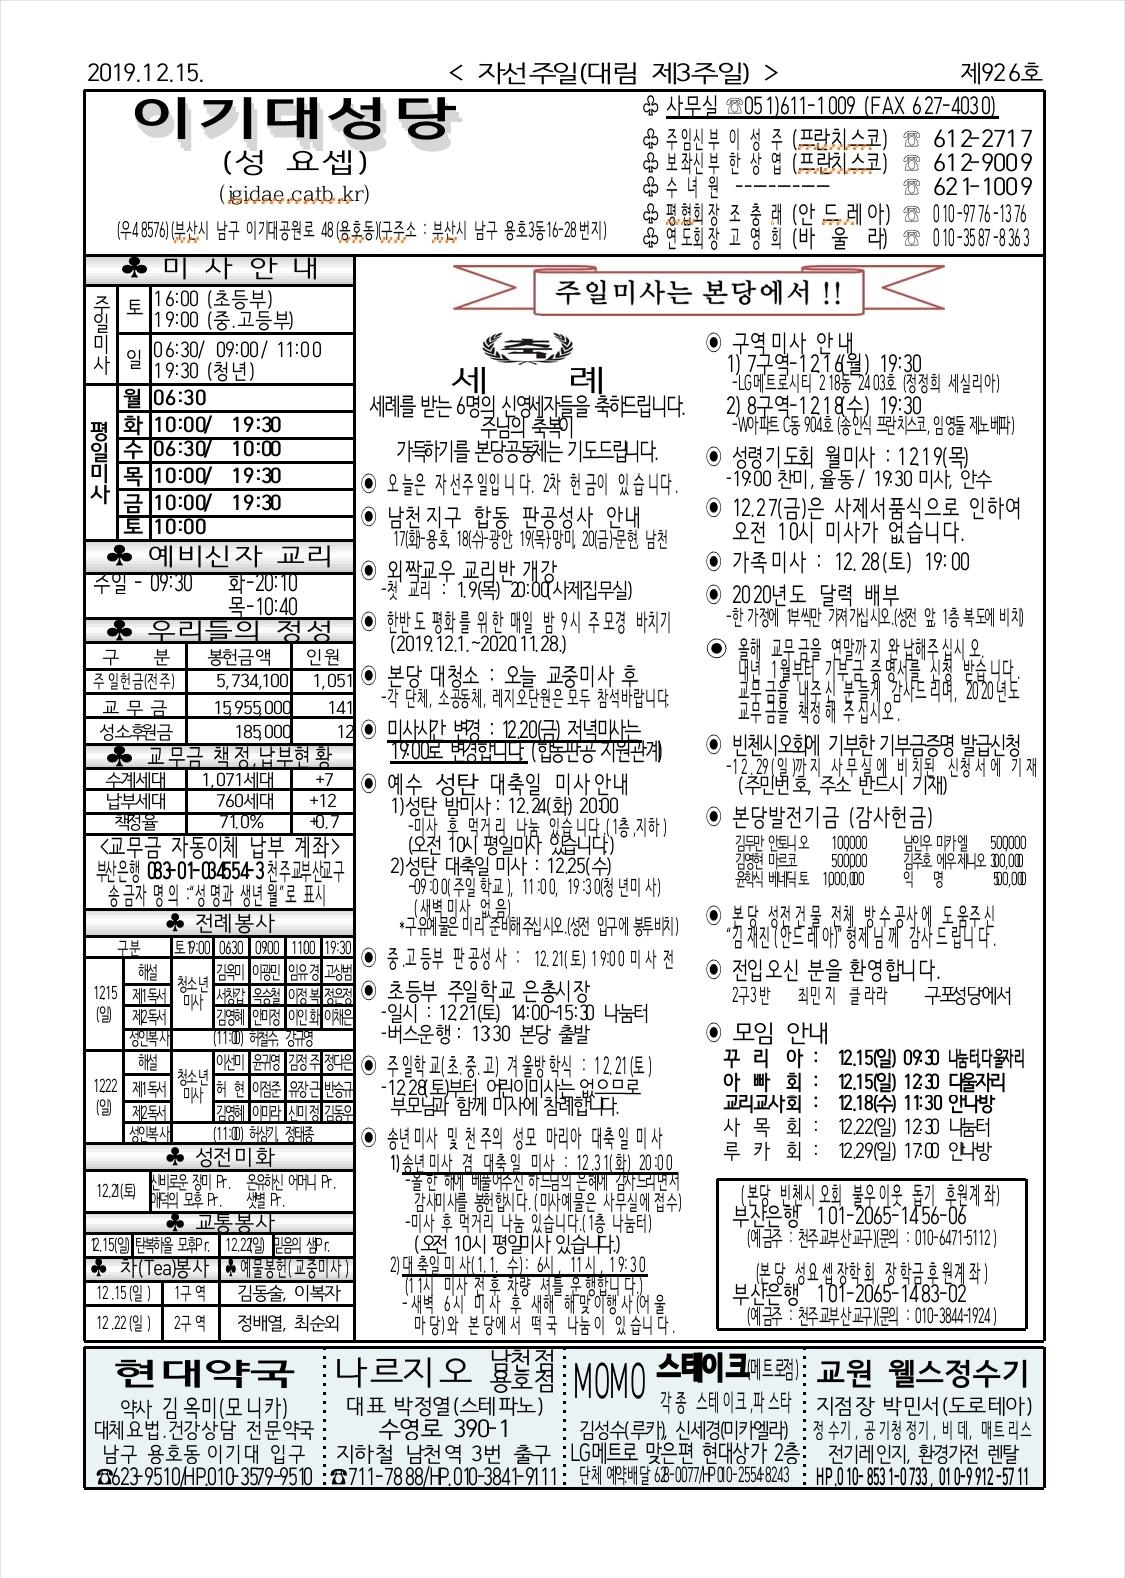 2AD7ADD6-5B16-4750-91F3-720C79C69797.jpeg